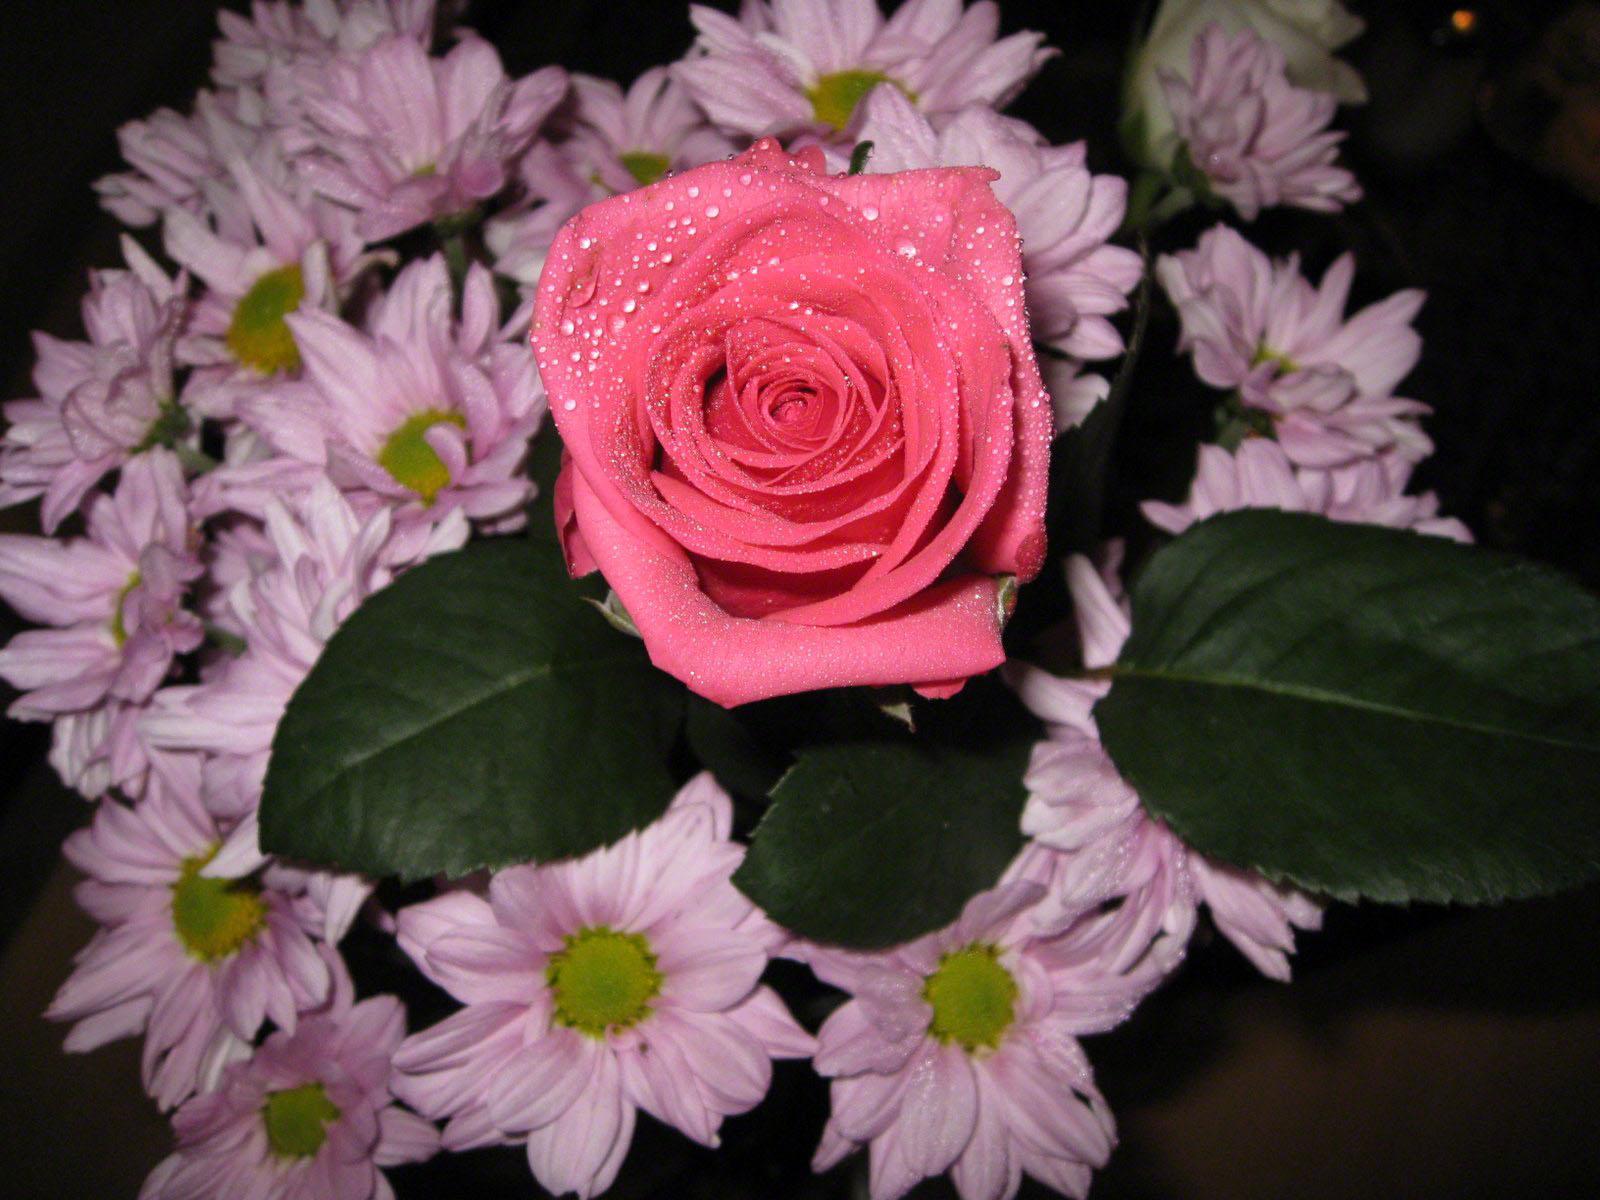 http://www.fabiovisentin.com/photography/photo/12/roses-wallpaper-roses-bouquets4441.JPG